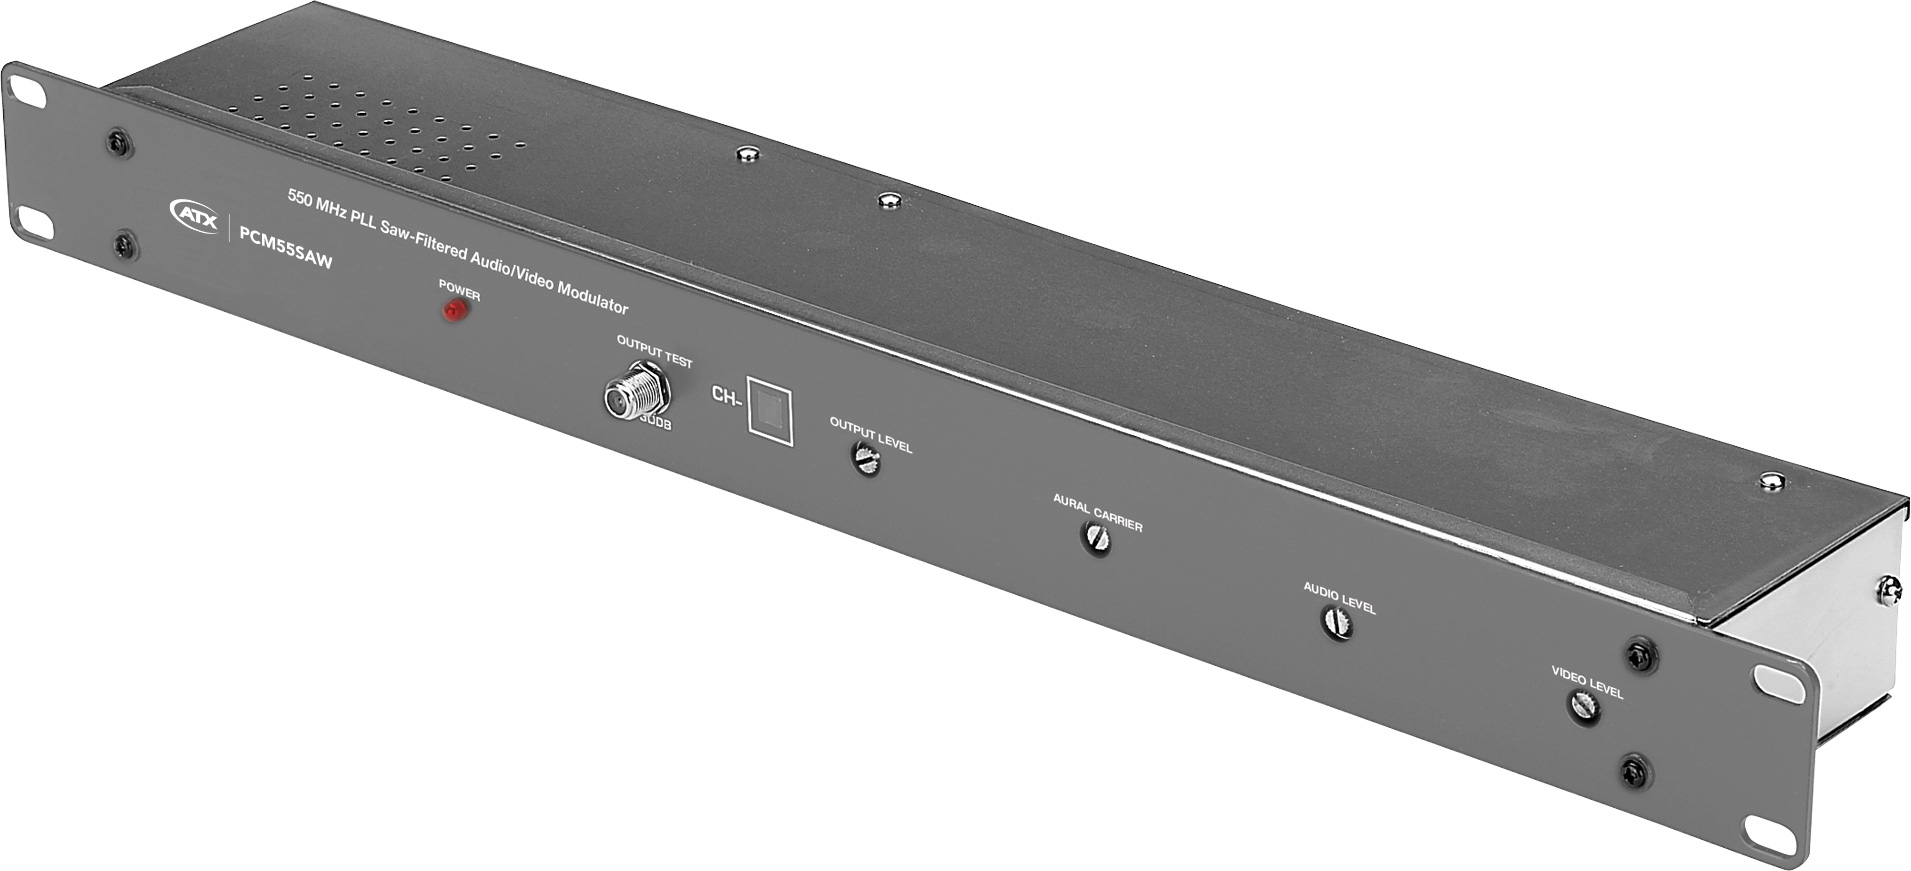 1 Channel Crystal A/V Modulator - Channel 25 PM-PCM55SAW-25